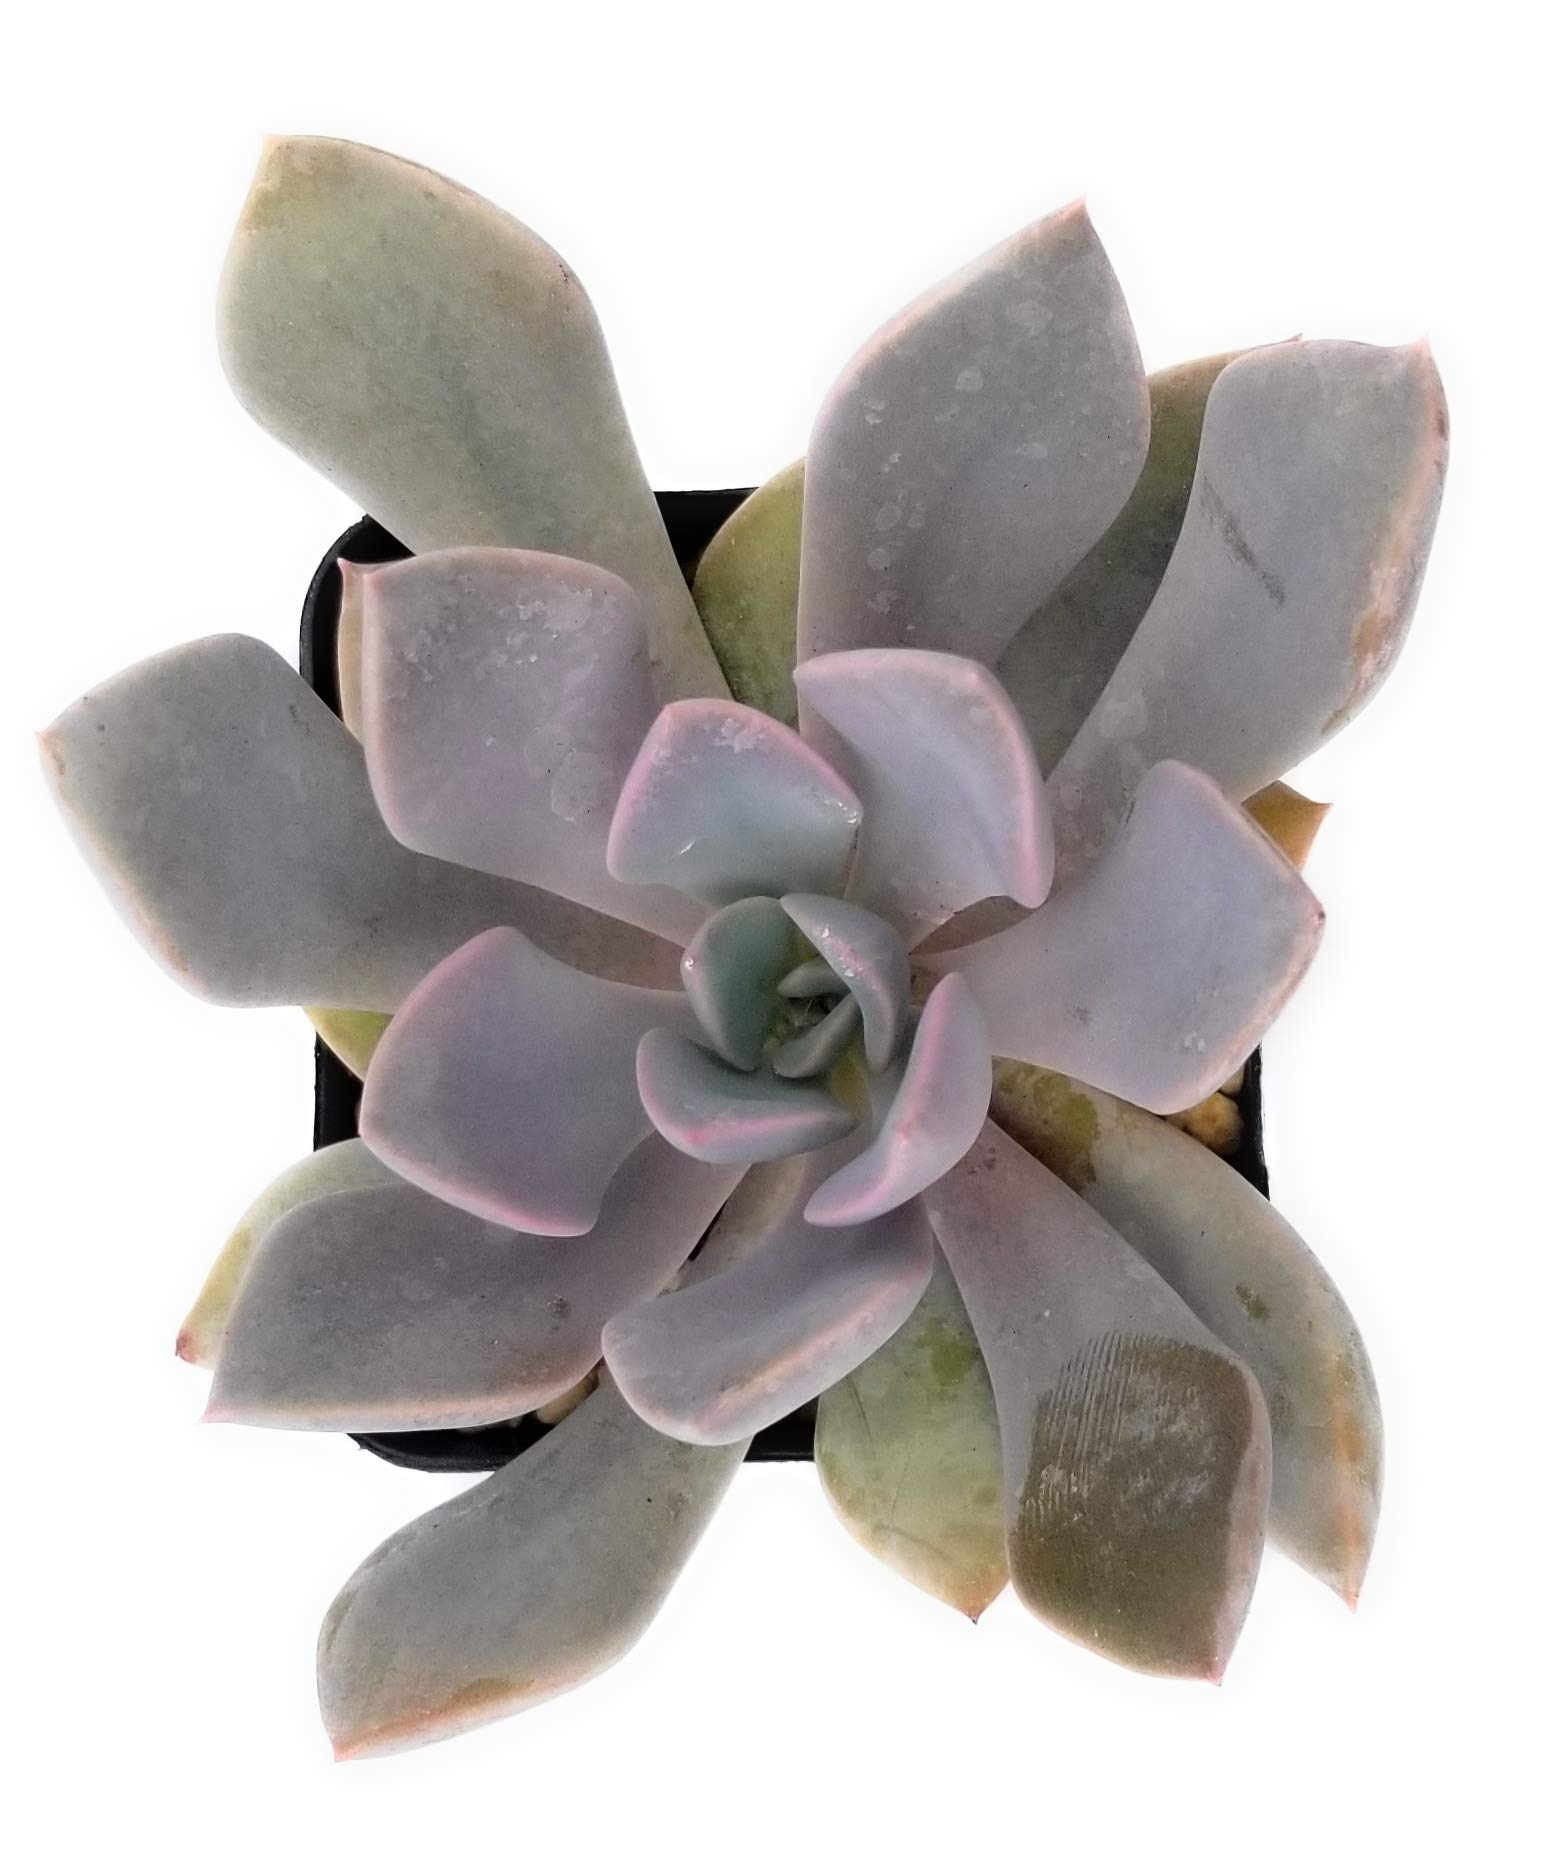 Fat Plants San Diego Live Echeveria Succulent Plant in a 4 inch Plastic Growers Pot (2.5 inch, graptoveria Debbie)